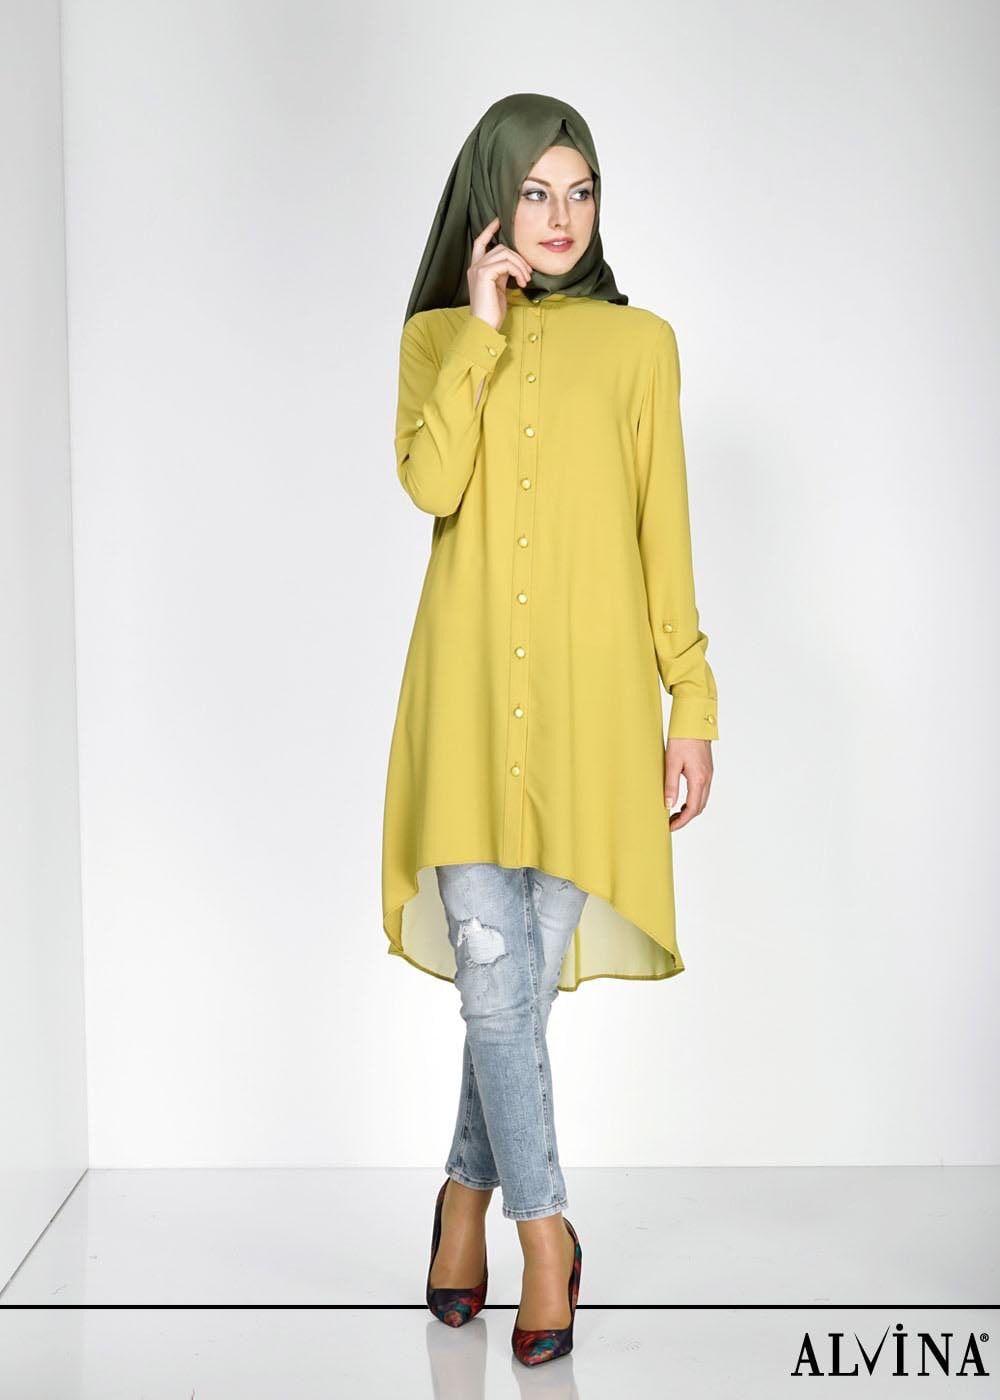 Jaket Wanita SDD 375 Model Fashion Dengan Style Terbaru Pinterest